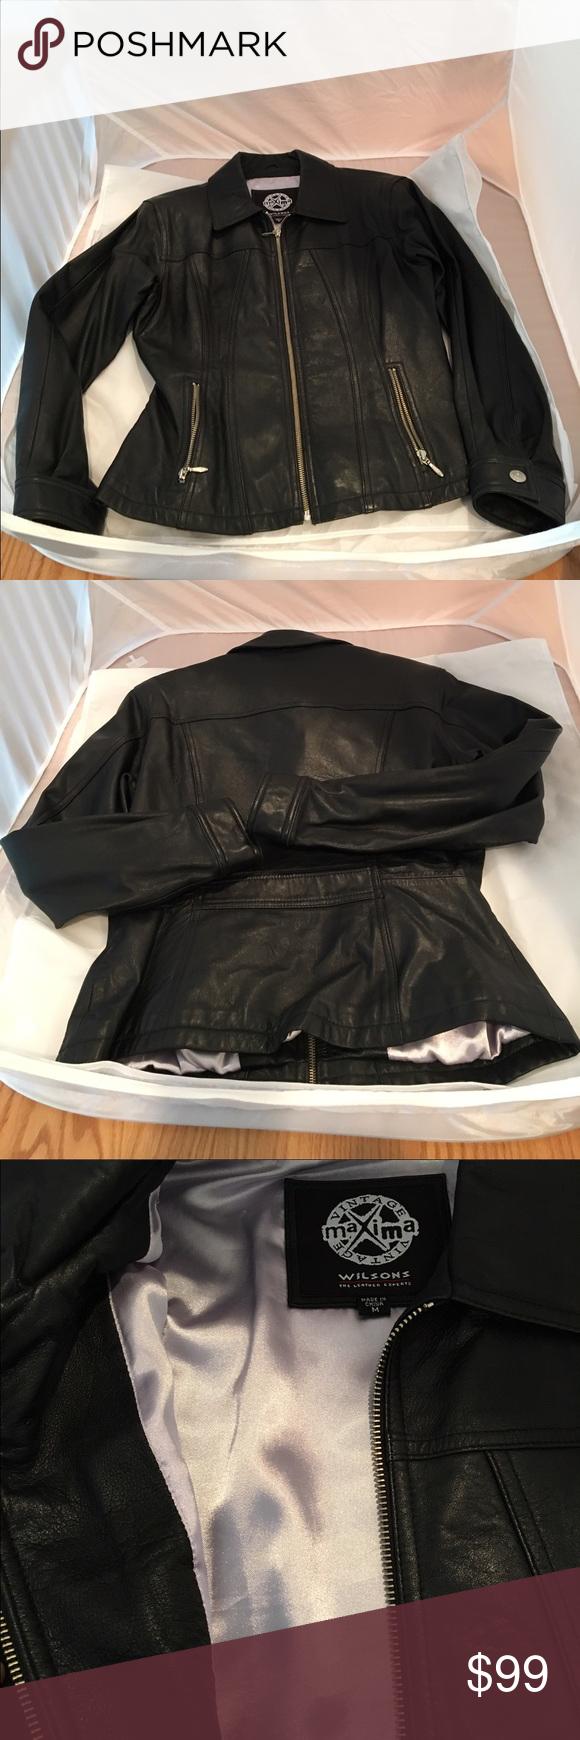 Wilsons Vintage Maxima leather jacket Leather jacket